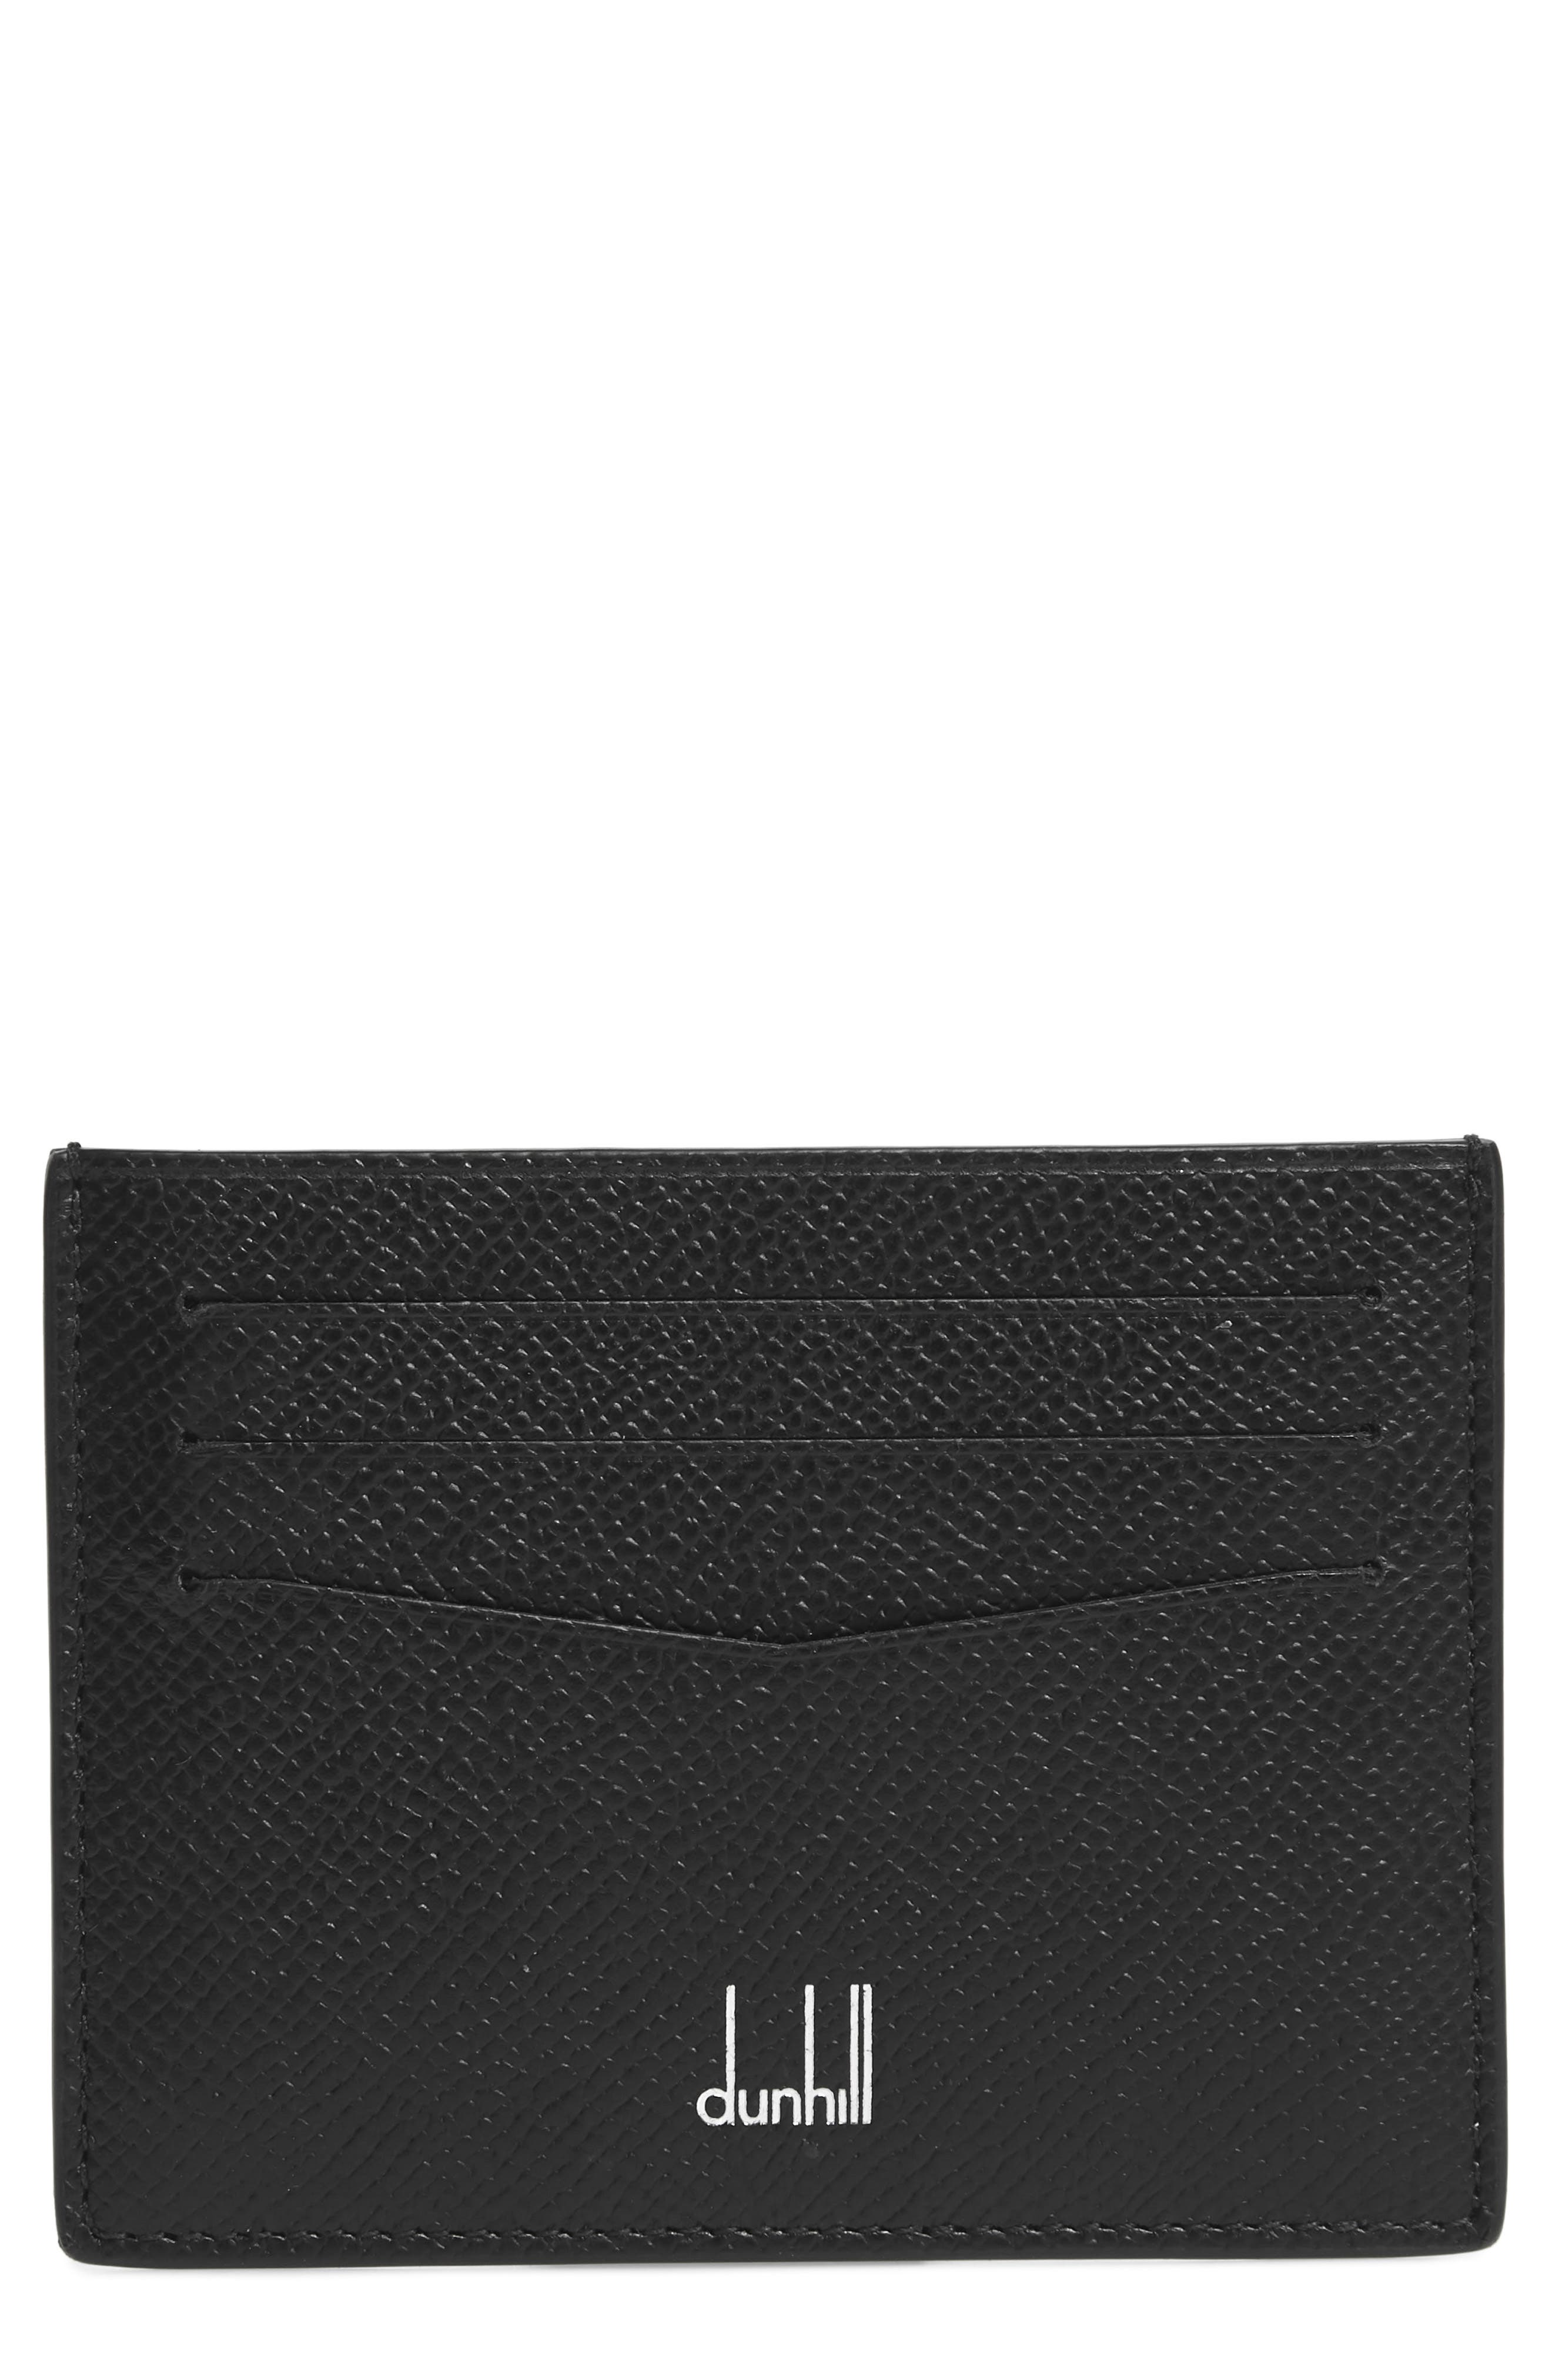 Dunhill Cadogan Leather Card Case - Black